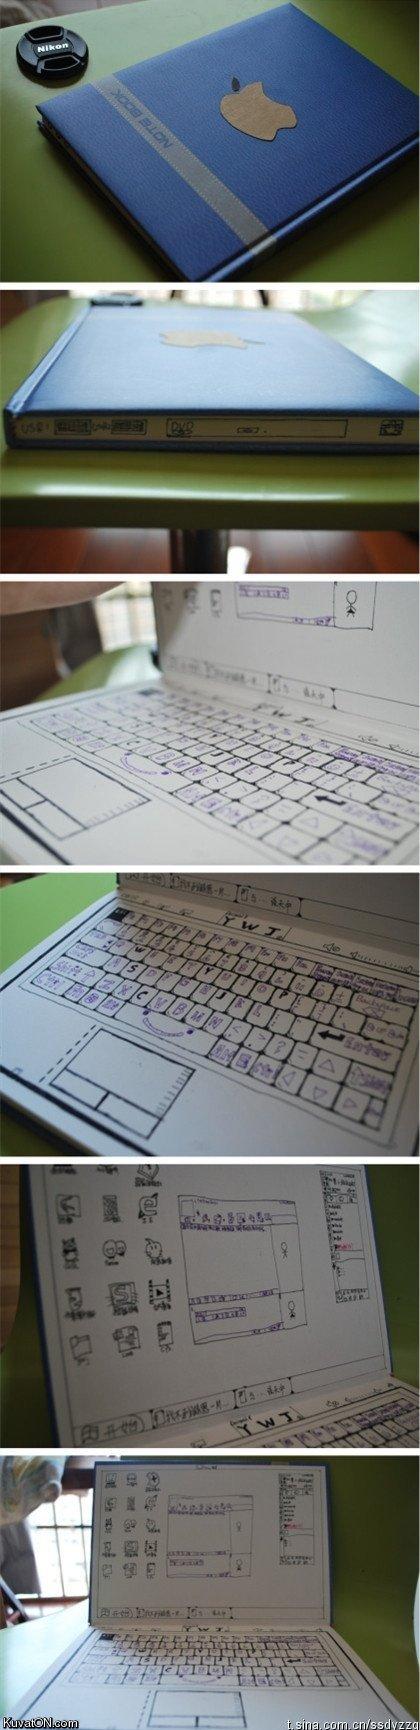 L'univers des Geeks - Page 3 Mac_notebook